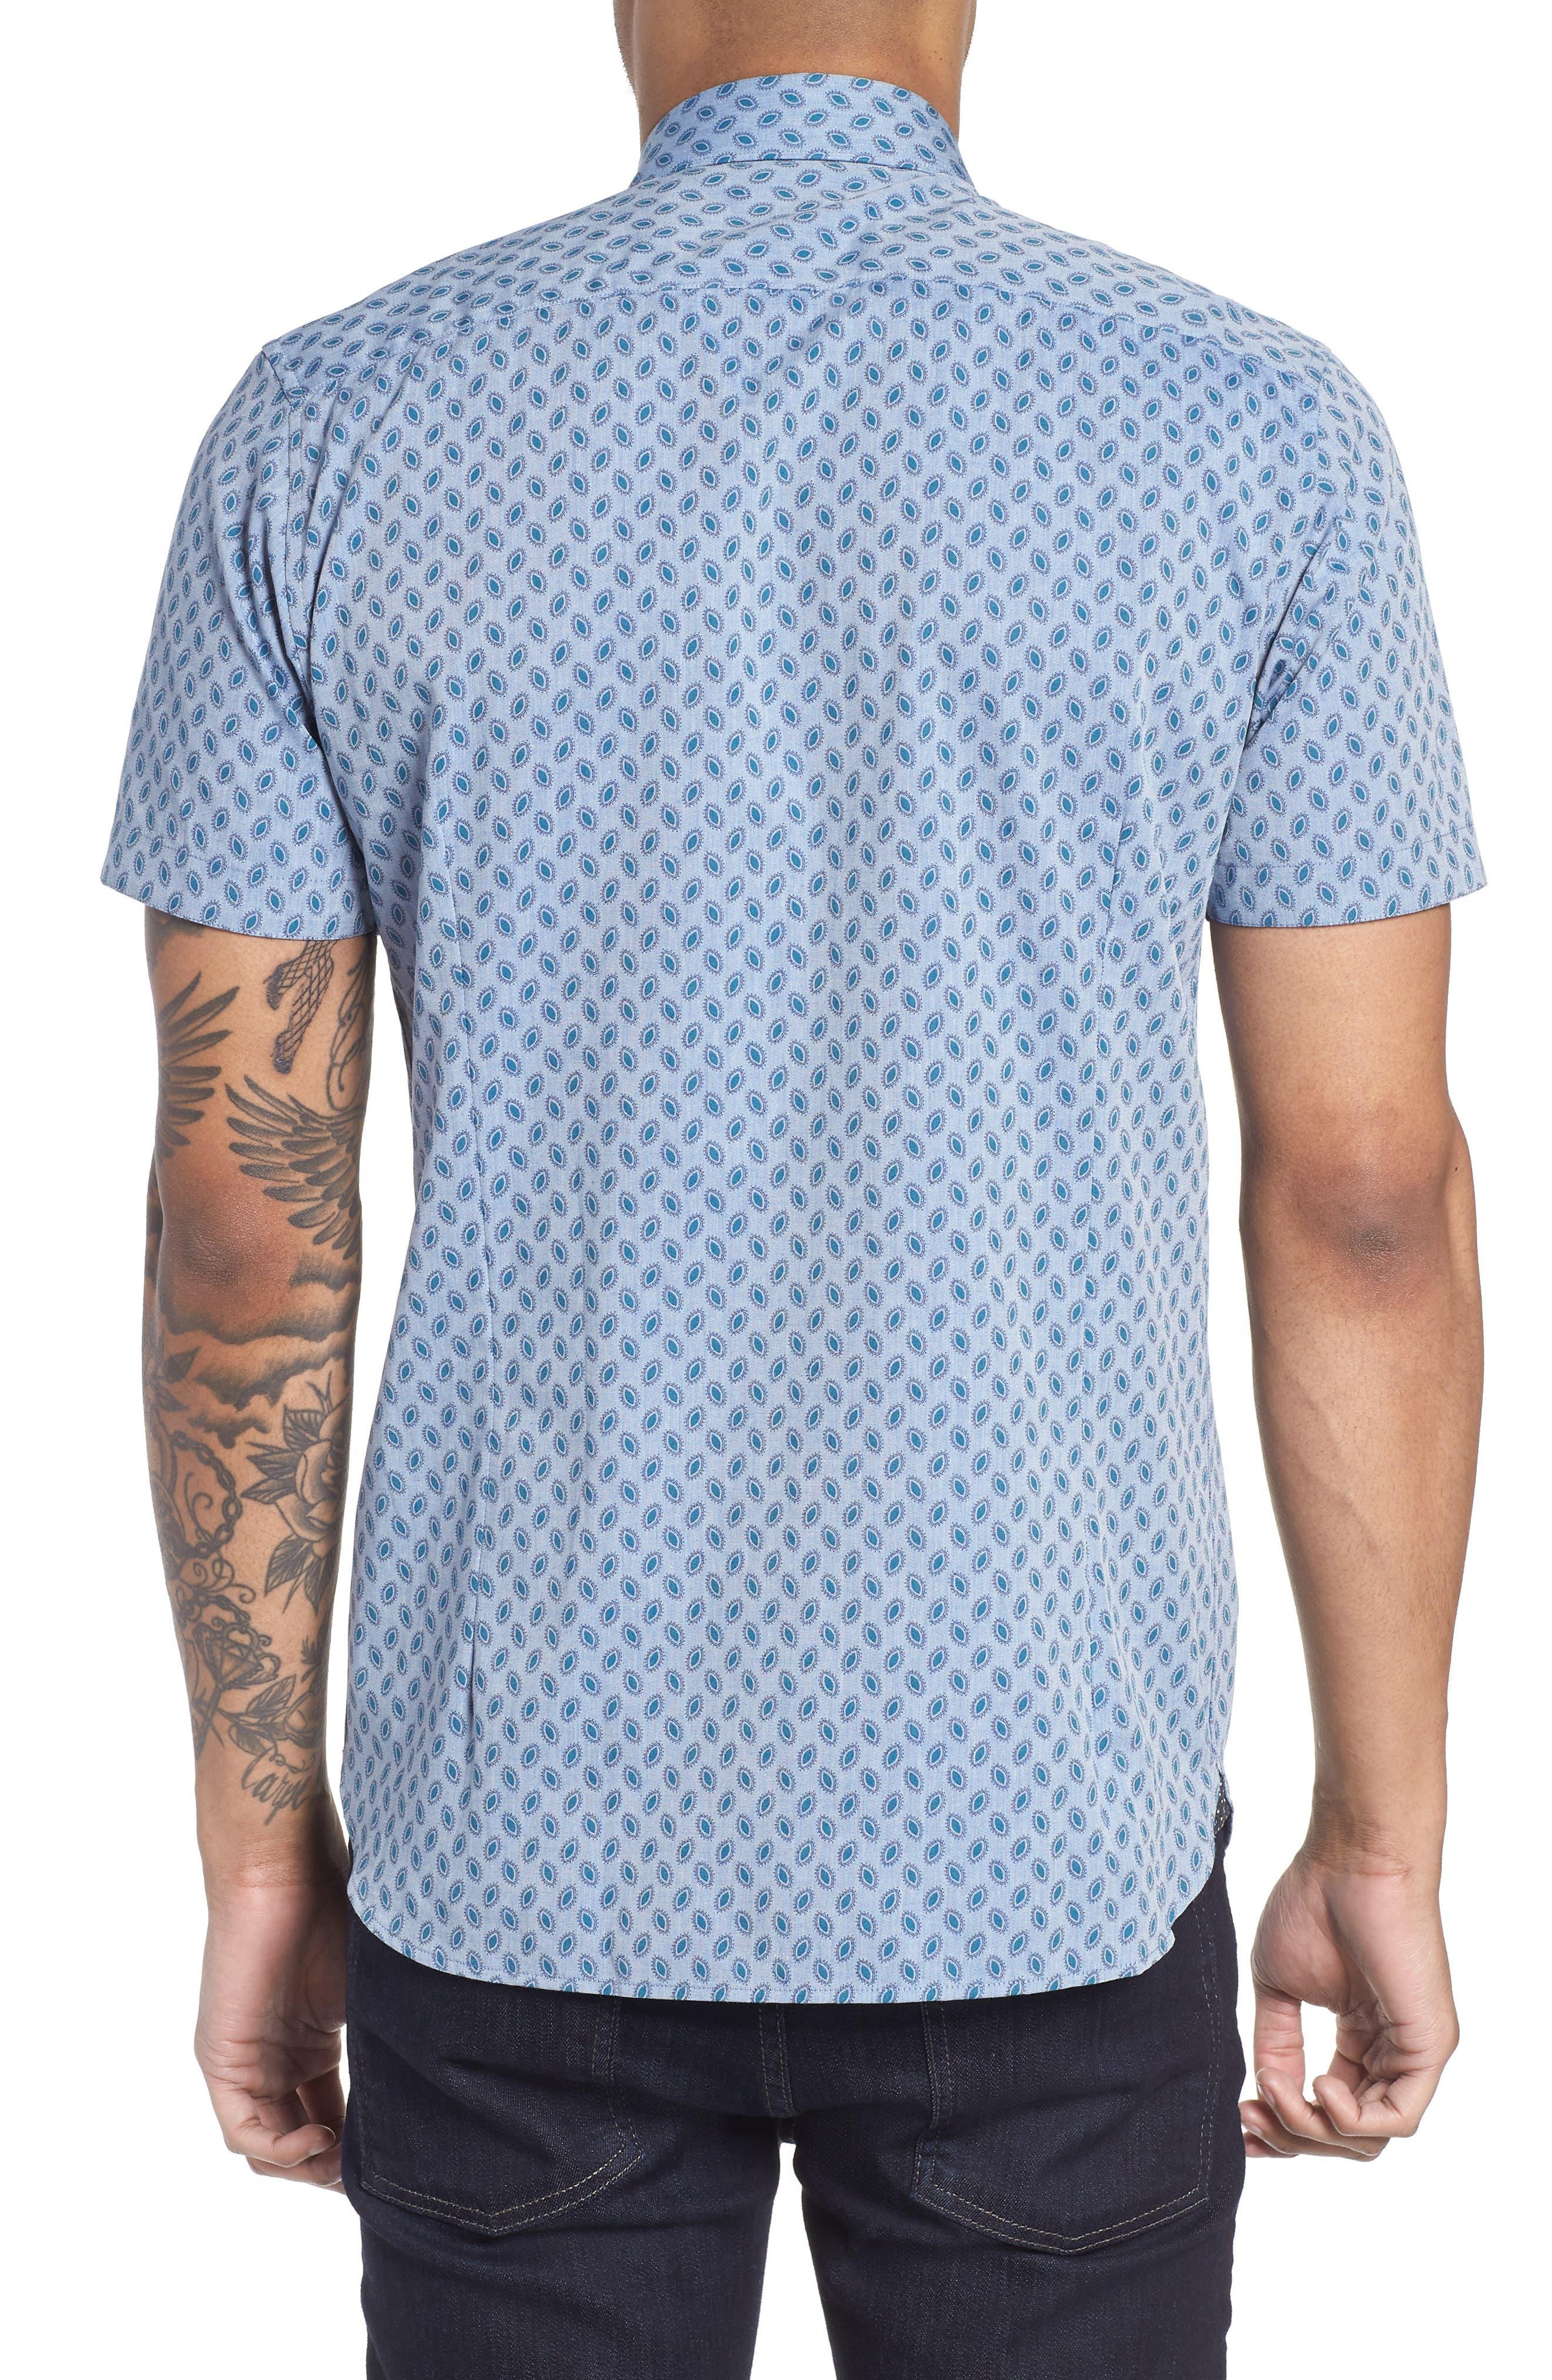 Newfott Extra Slim Fit Short Sleeve Sport Shirt,                             Alternate thumbnail 3, color,                             Blue